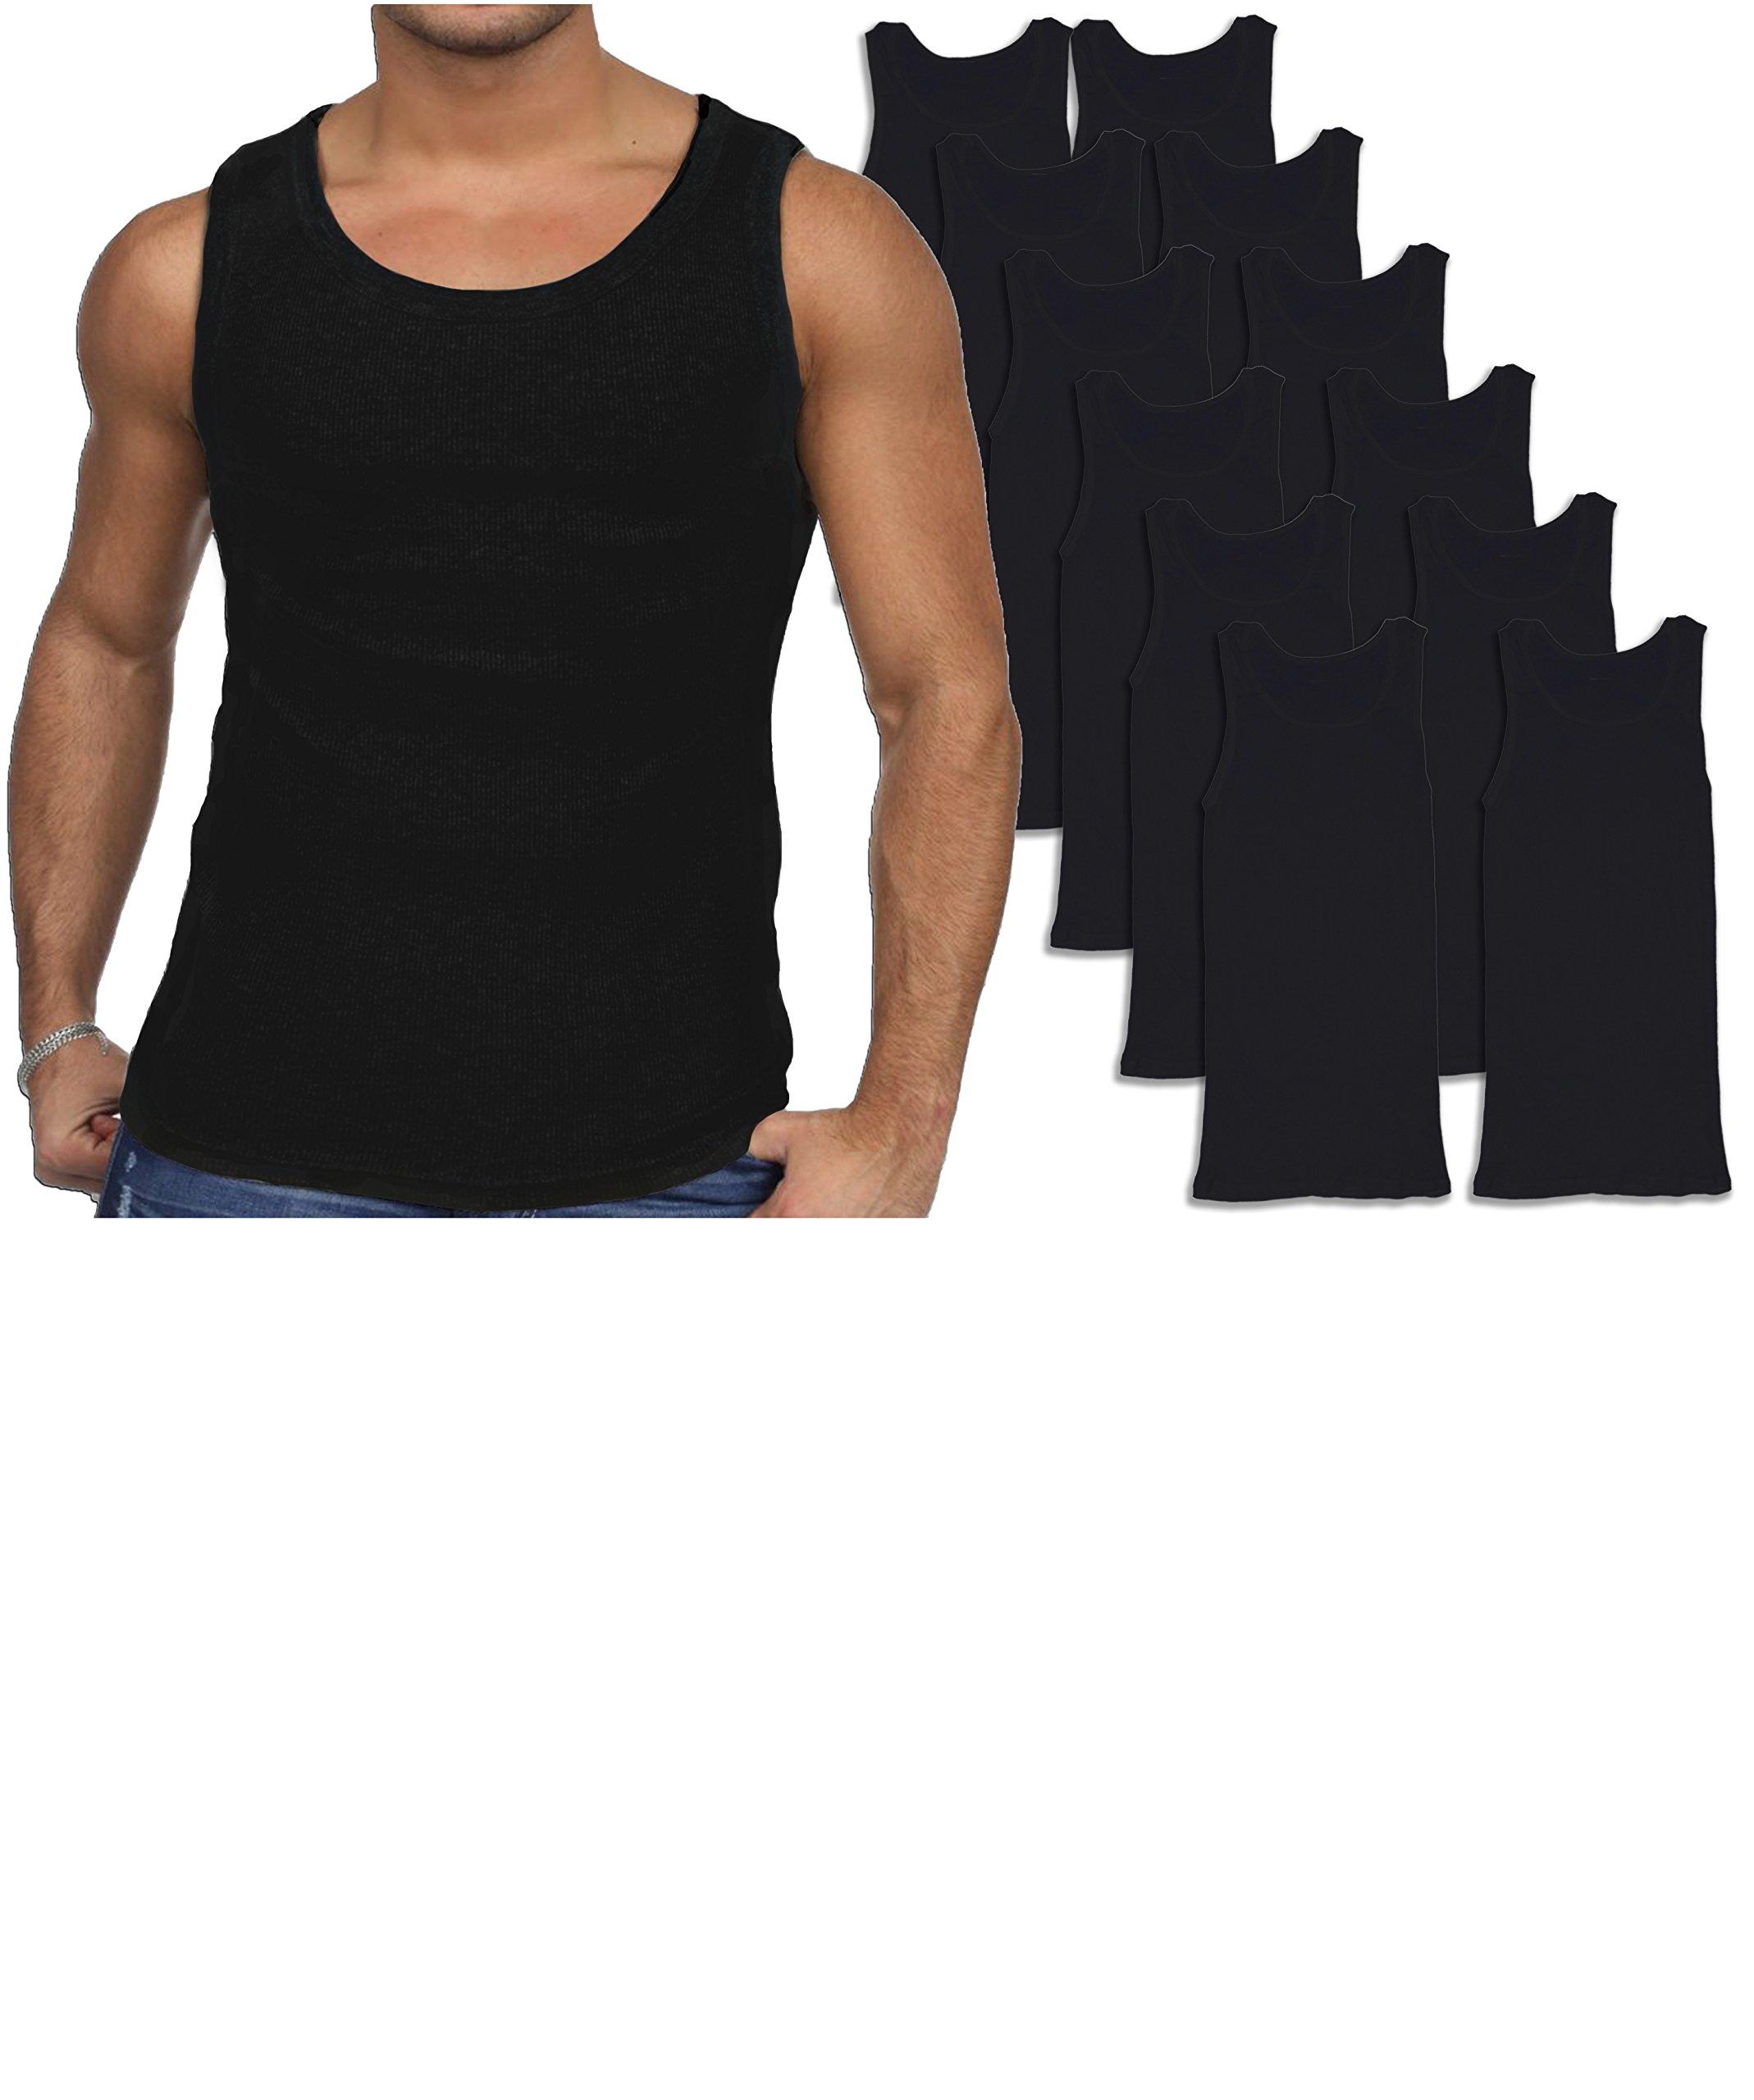 Andrew Scott Men's 12 Pack Color Tank Top a Shirt (Large 42-44, 12 Pack - Black)